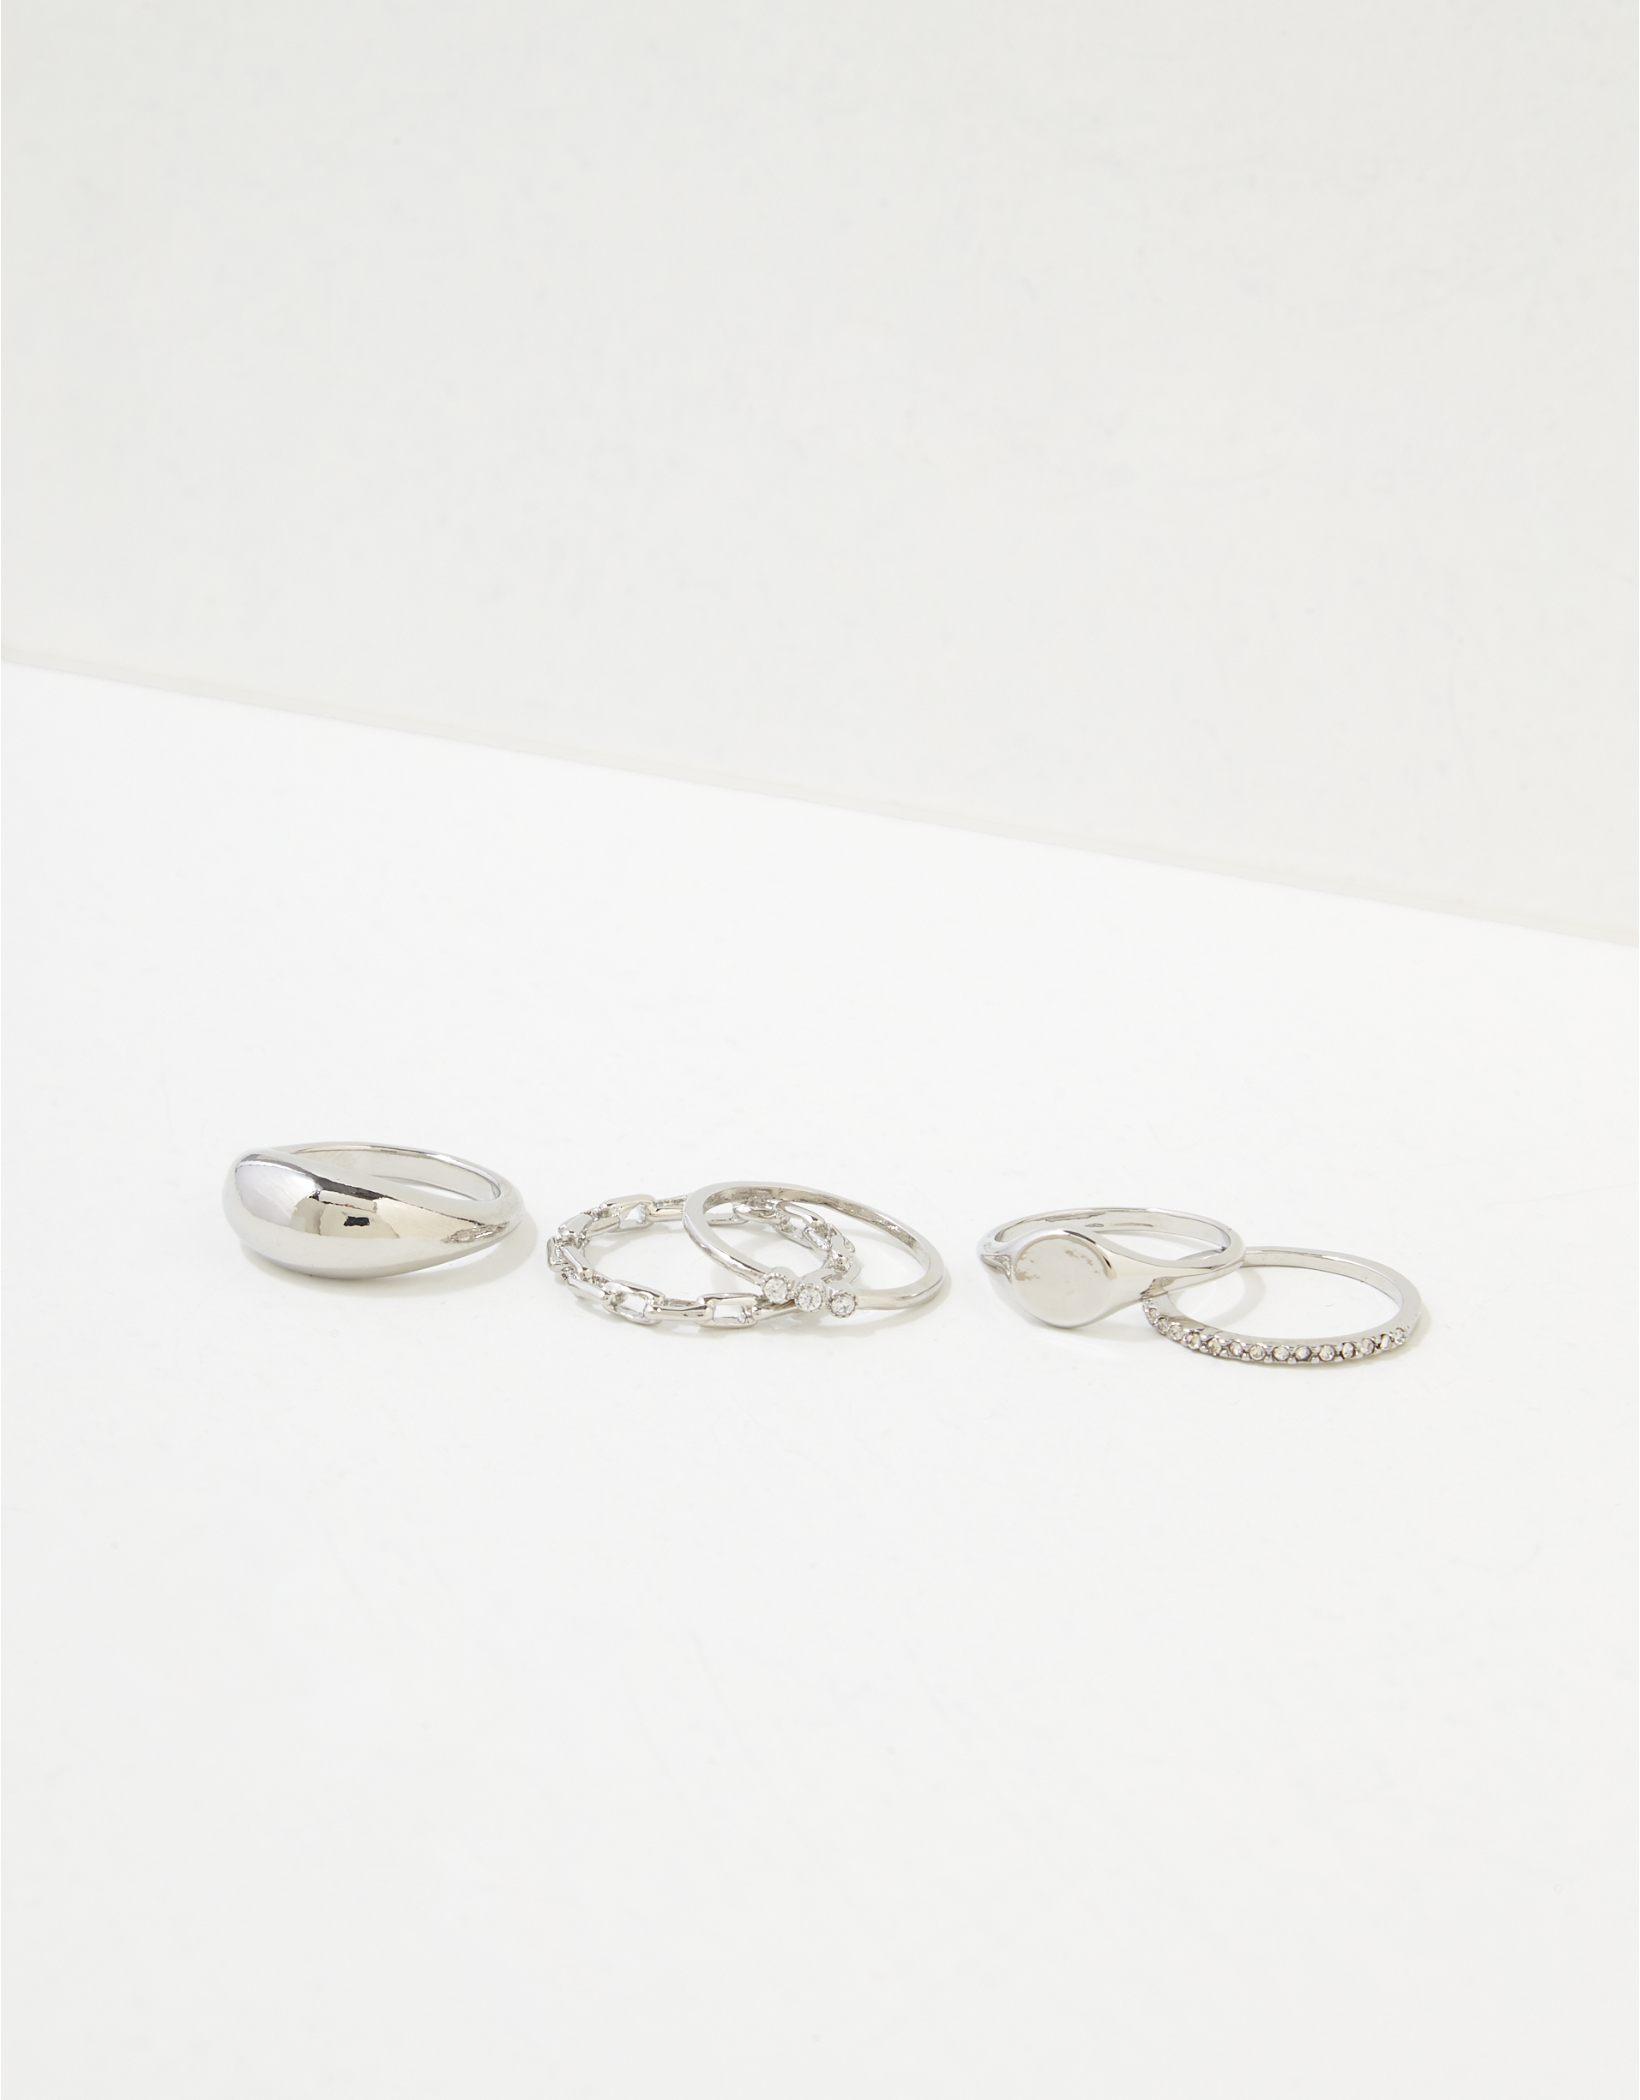 AEO Silver Rings 5-Pack